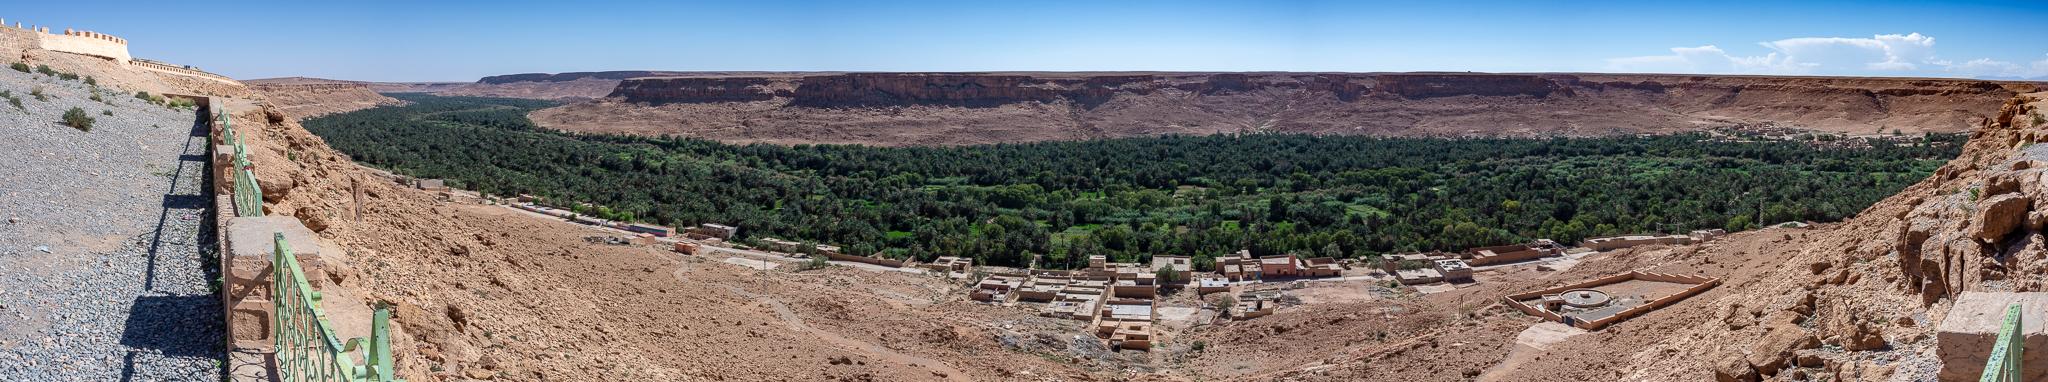 20181004_Marokko_003_1